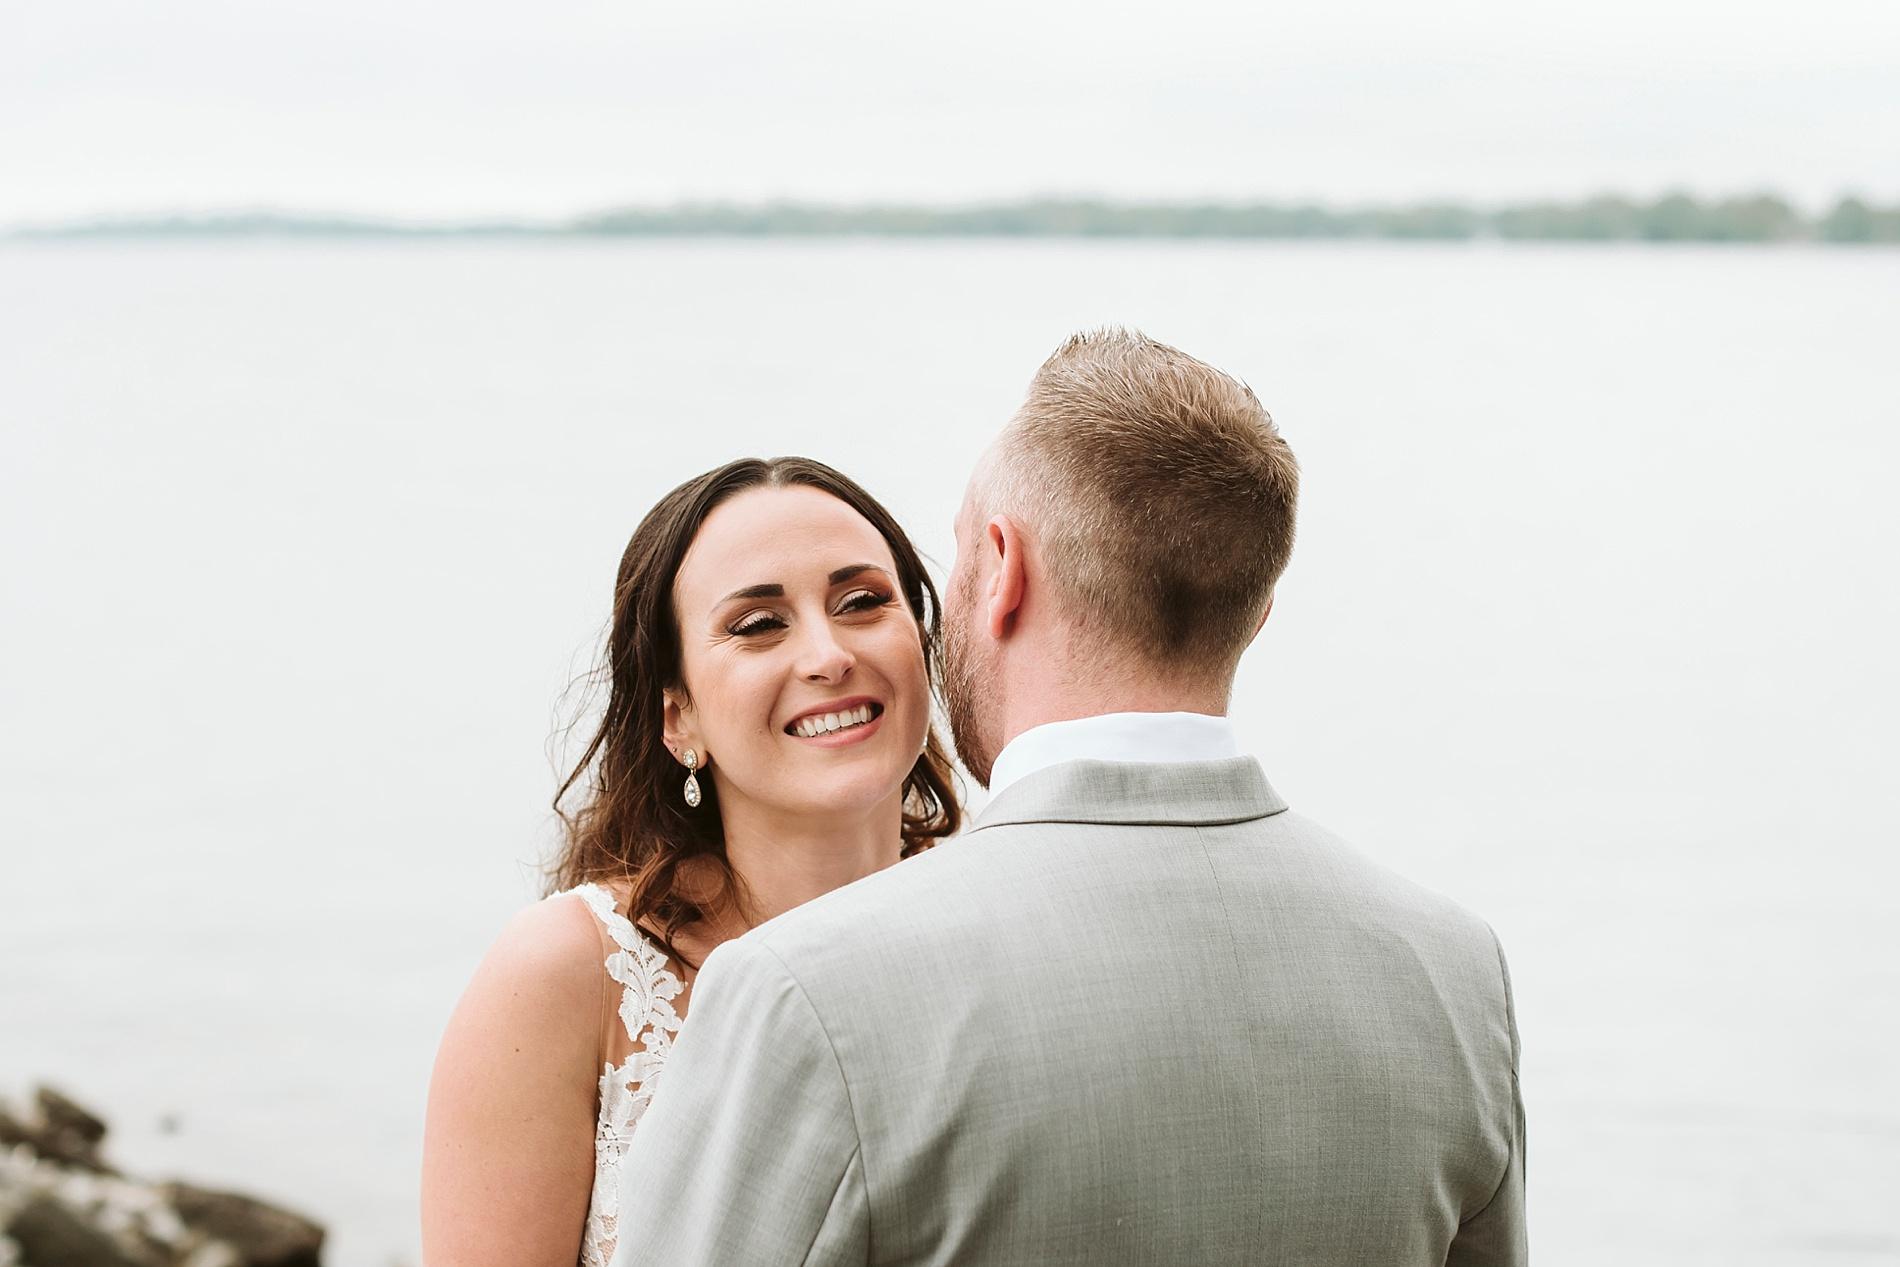 Kawartha_Lakes_Wedding_Bobcageon_Eganridge_Resort_Toronto_Photographer_0047.jpg